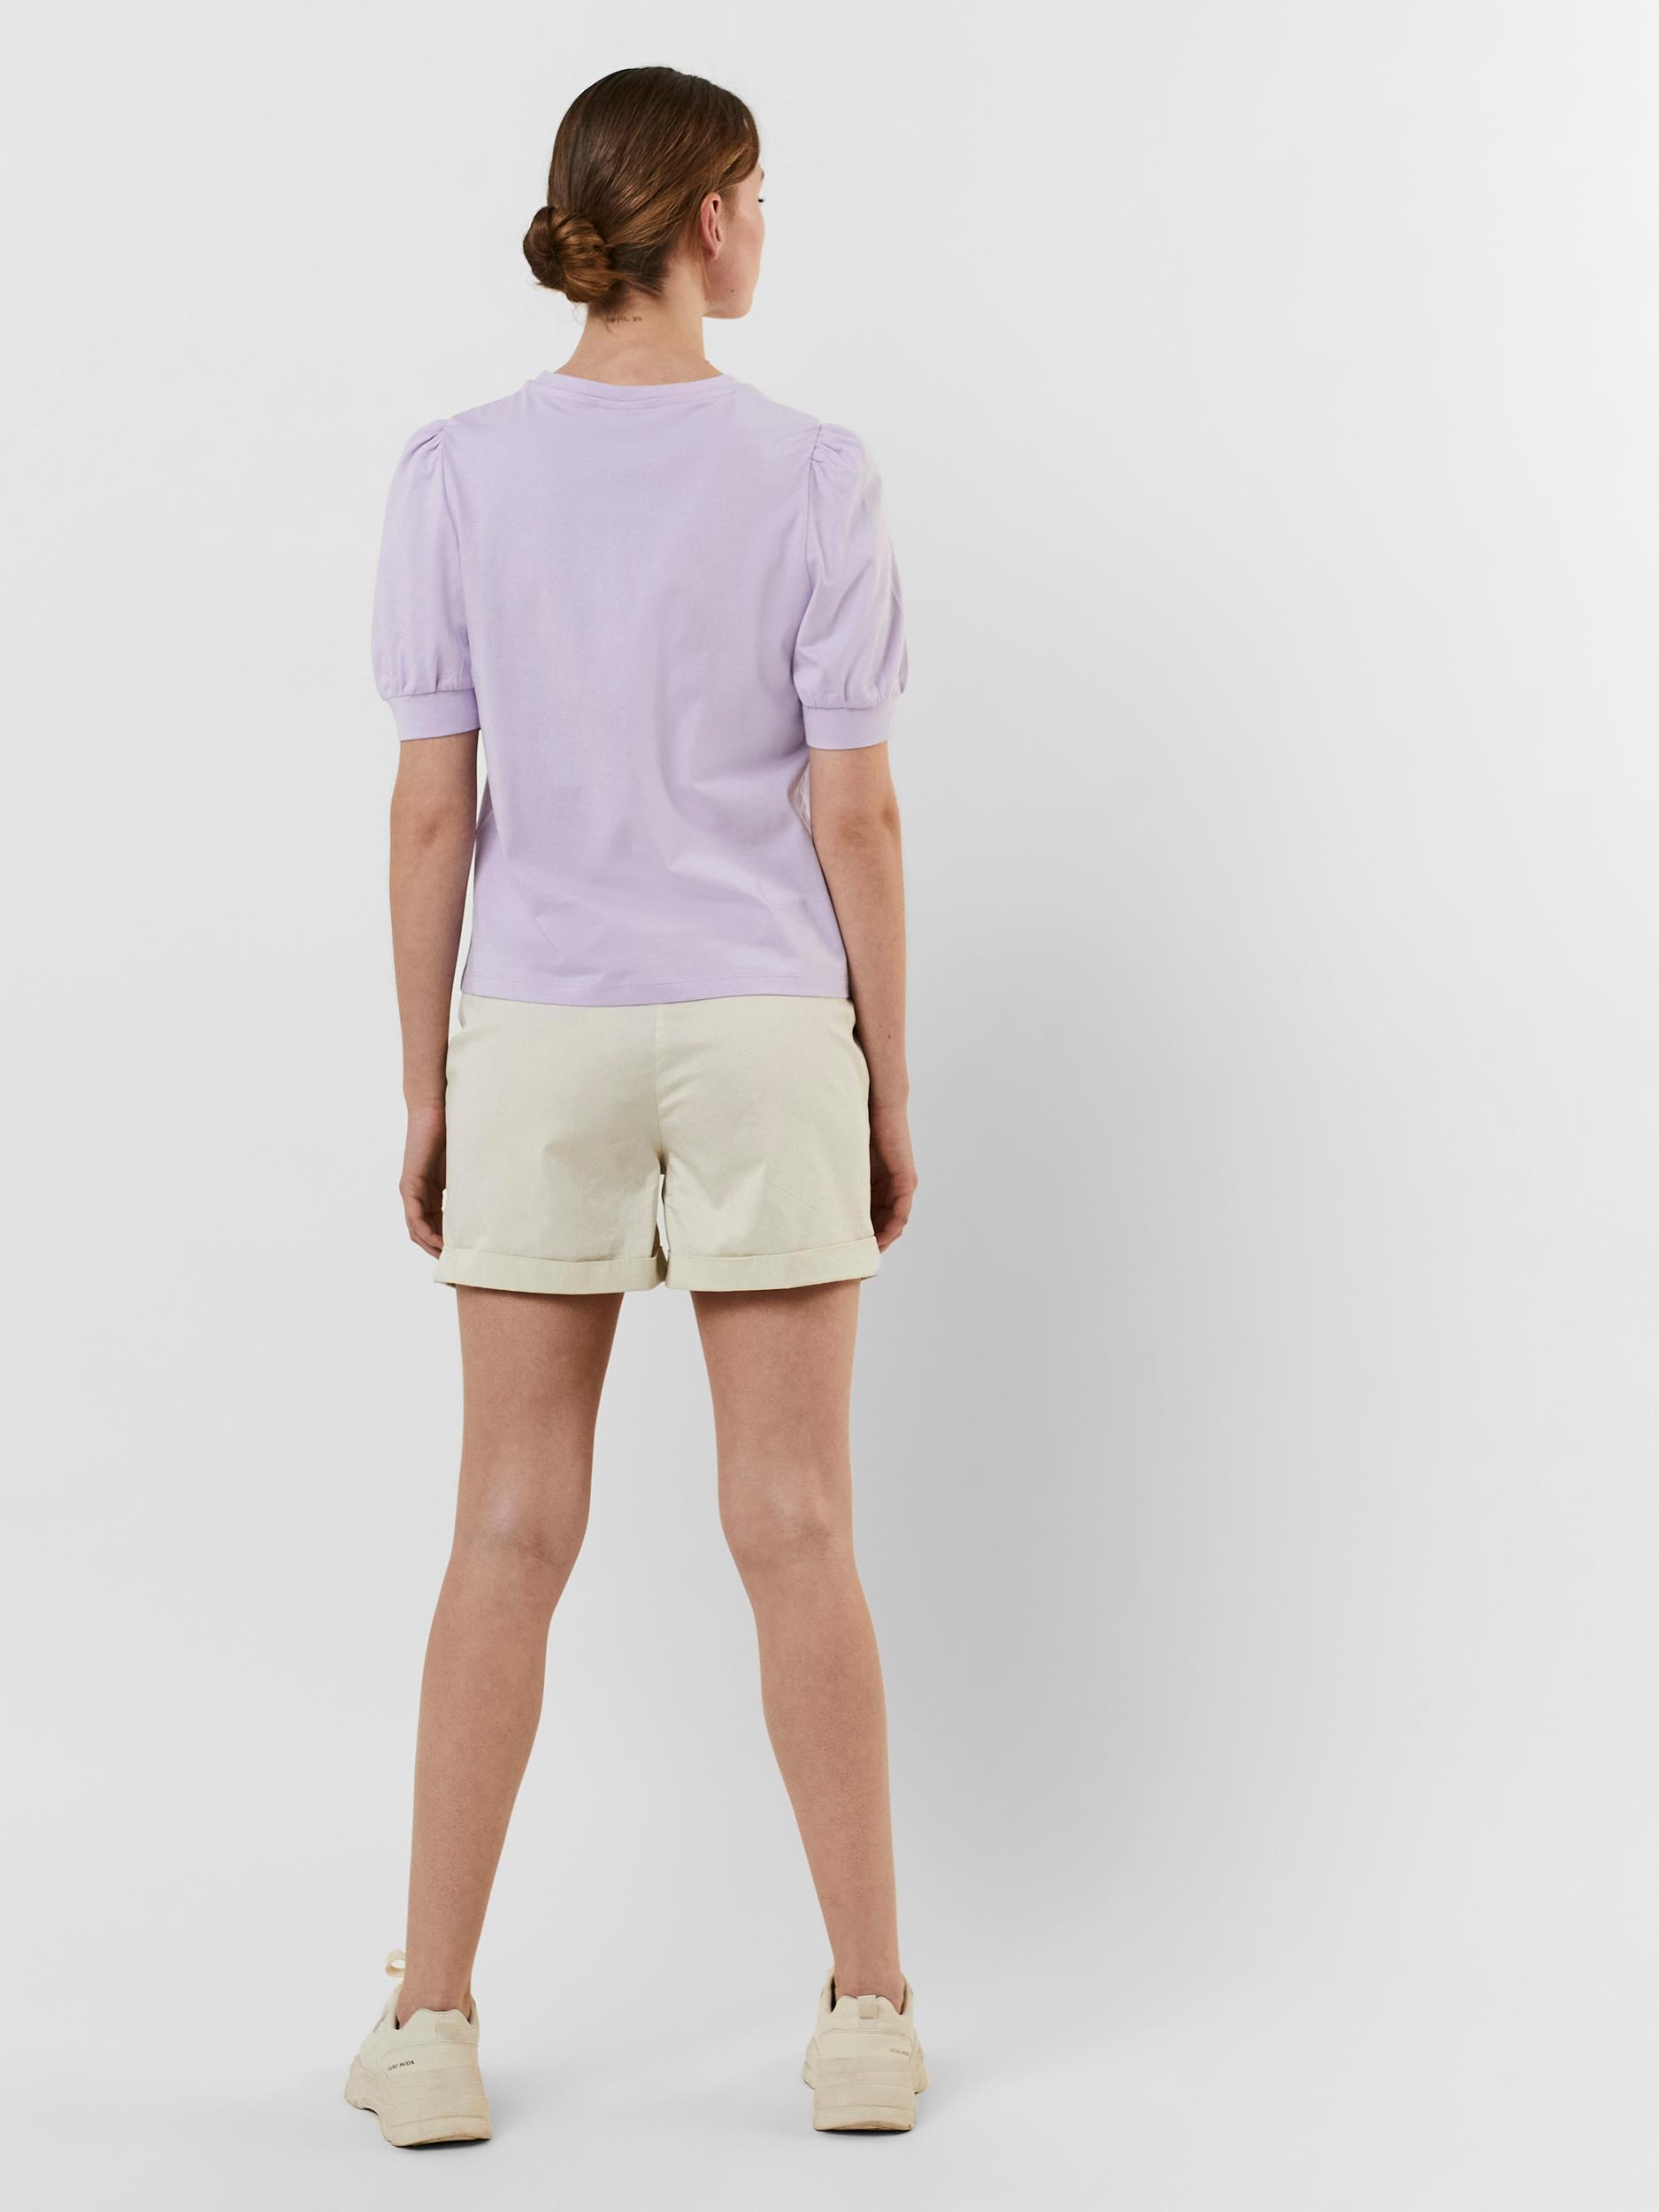 Vero Moda Kerry t-shirt, pastel lilac, small